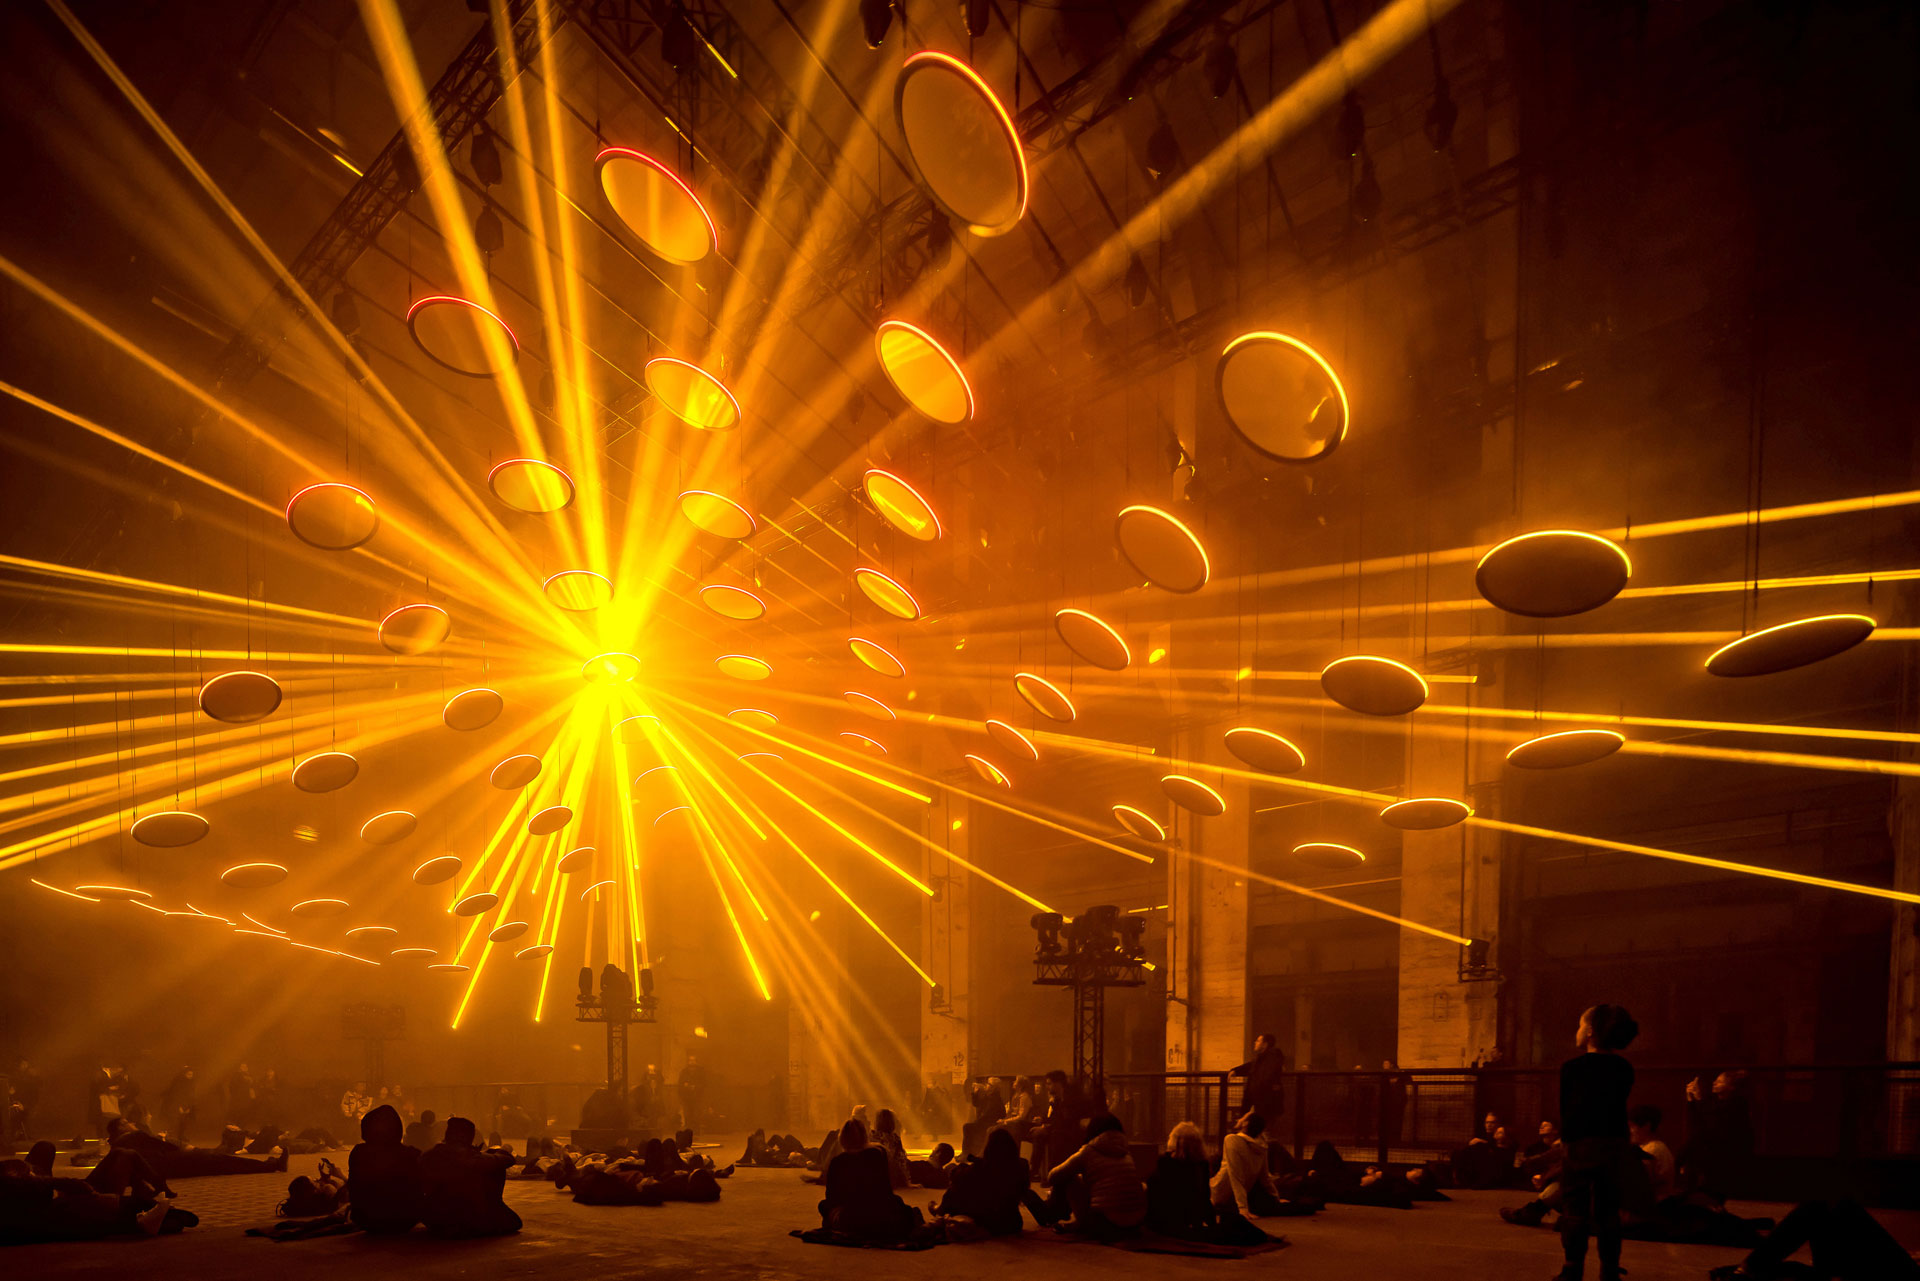 SKALAR - Reflections on Light and Sound